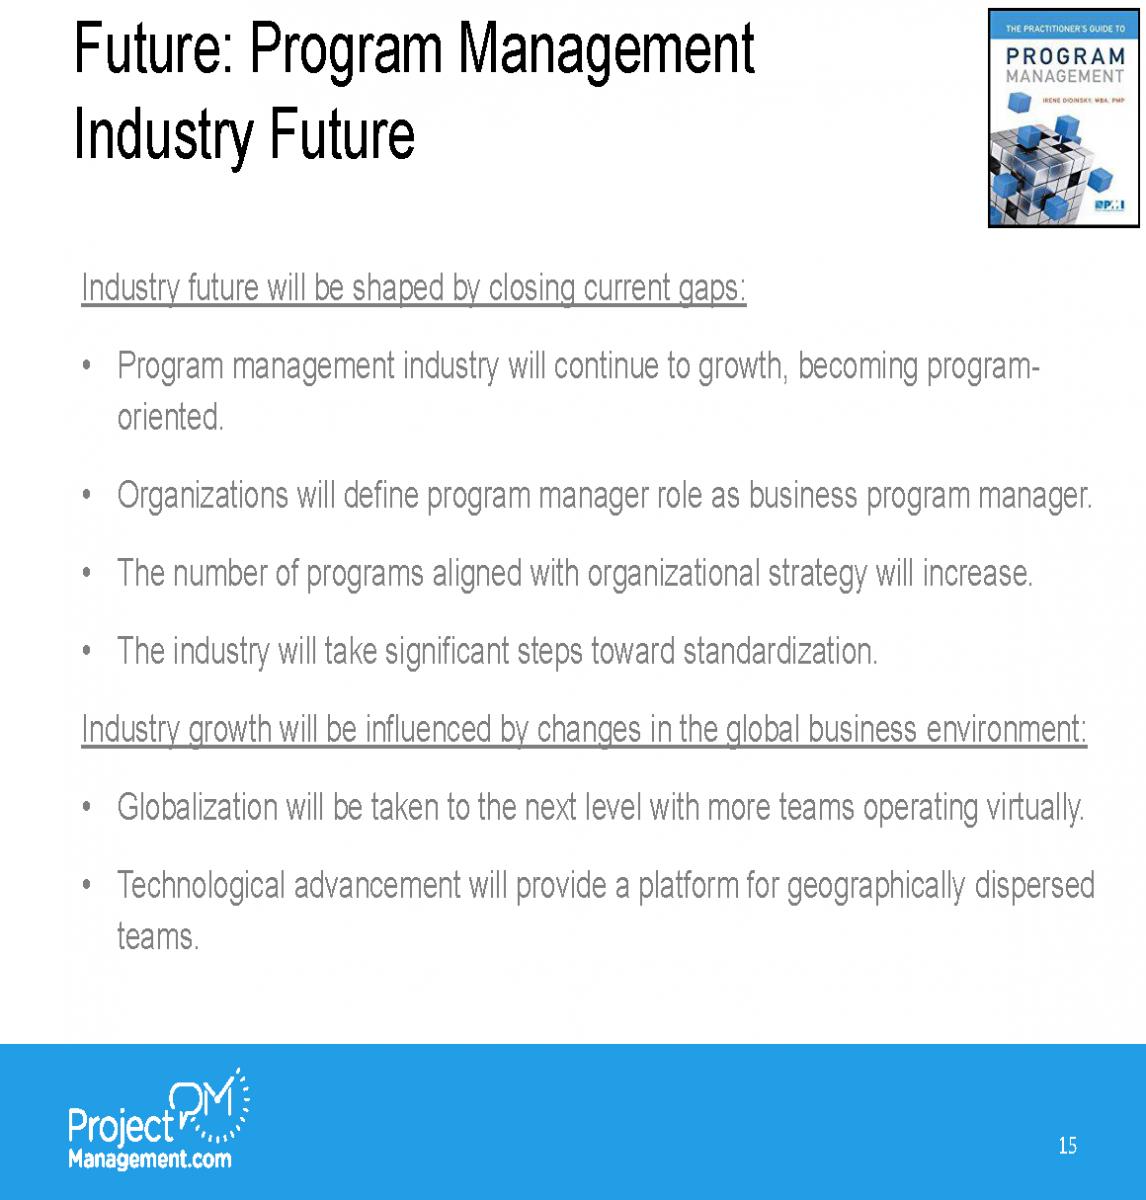 ProjectManagementcom webinar_Irene Didinsky_05112018_FinalFinal_Page_20